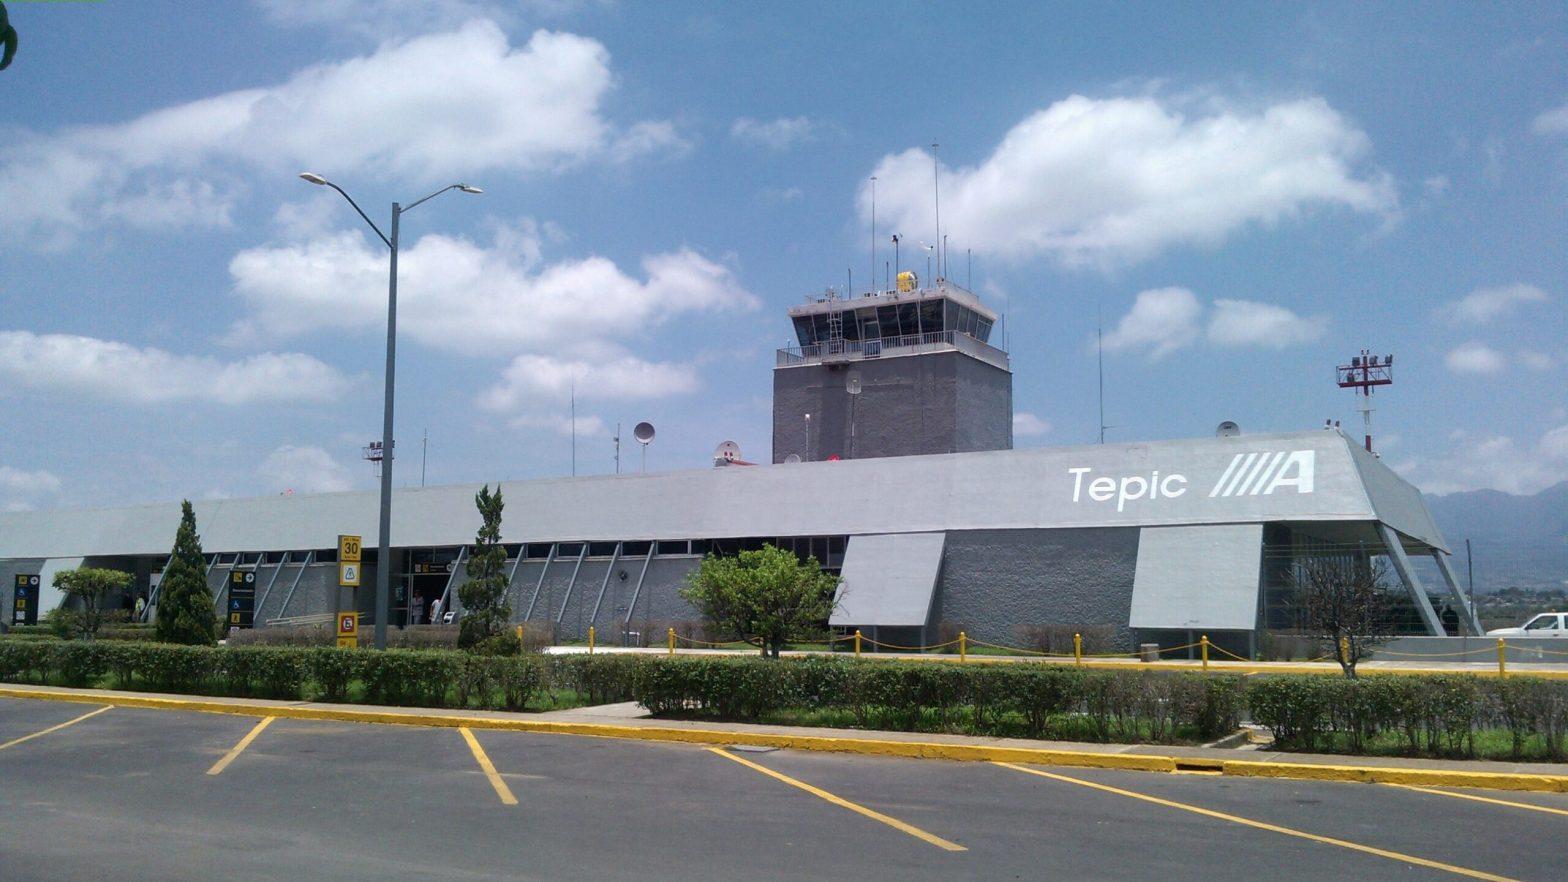 aeropuerto de Tepic, Nayarit